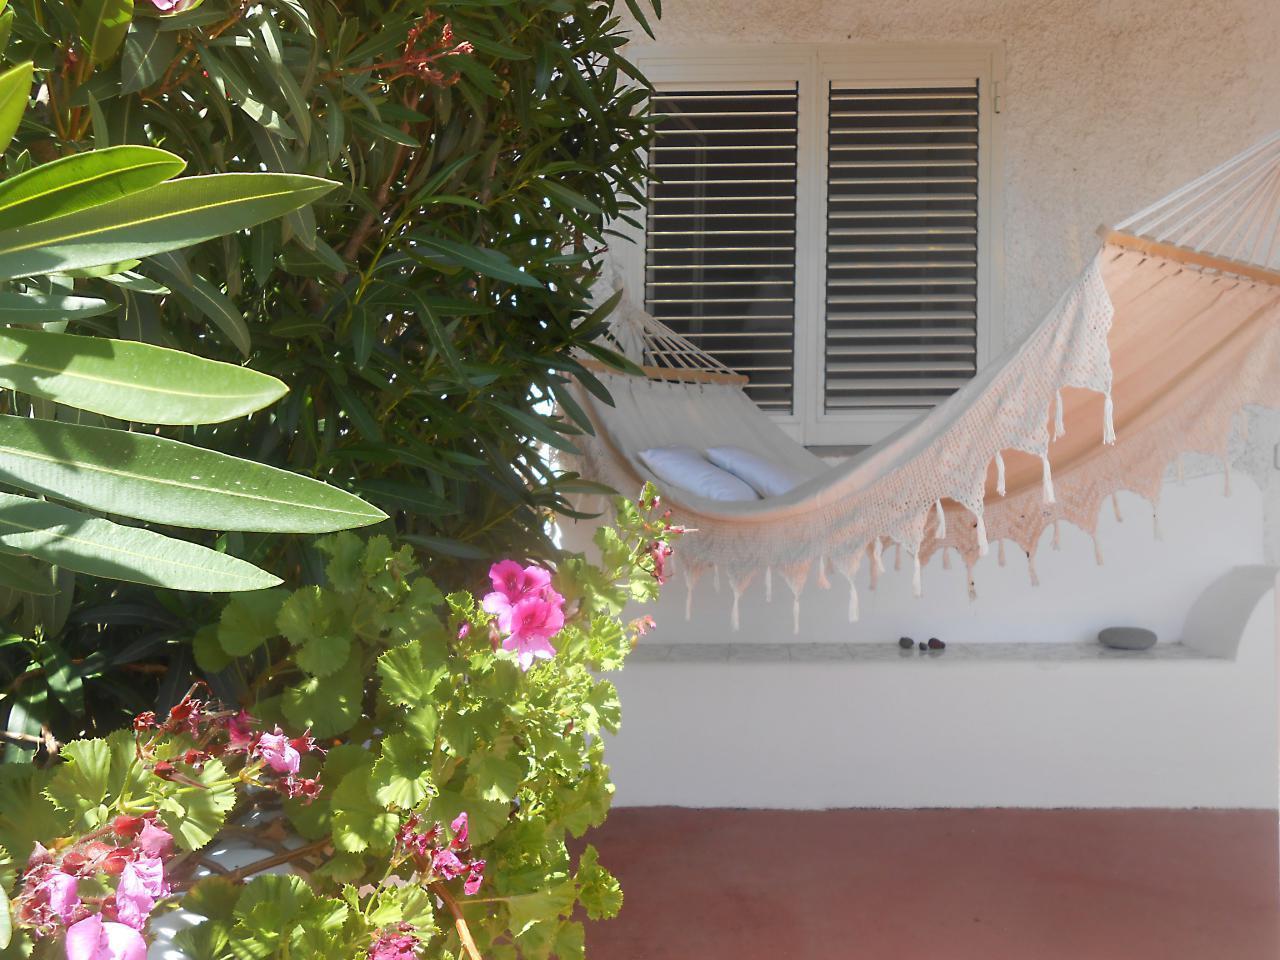 Maison de vacances Ferienhaushälfte Oleandro auf sizilianischer Insel mit atemberaubenden Meeres-Rundblick (2045159), Lipari, Lipari, Sicile, Italie, image 11